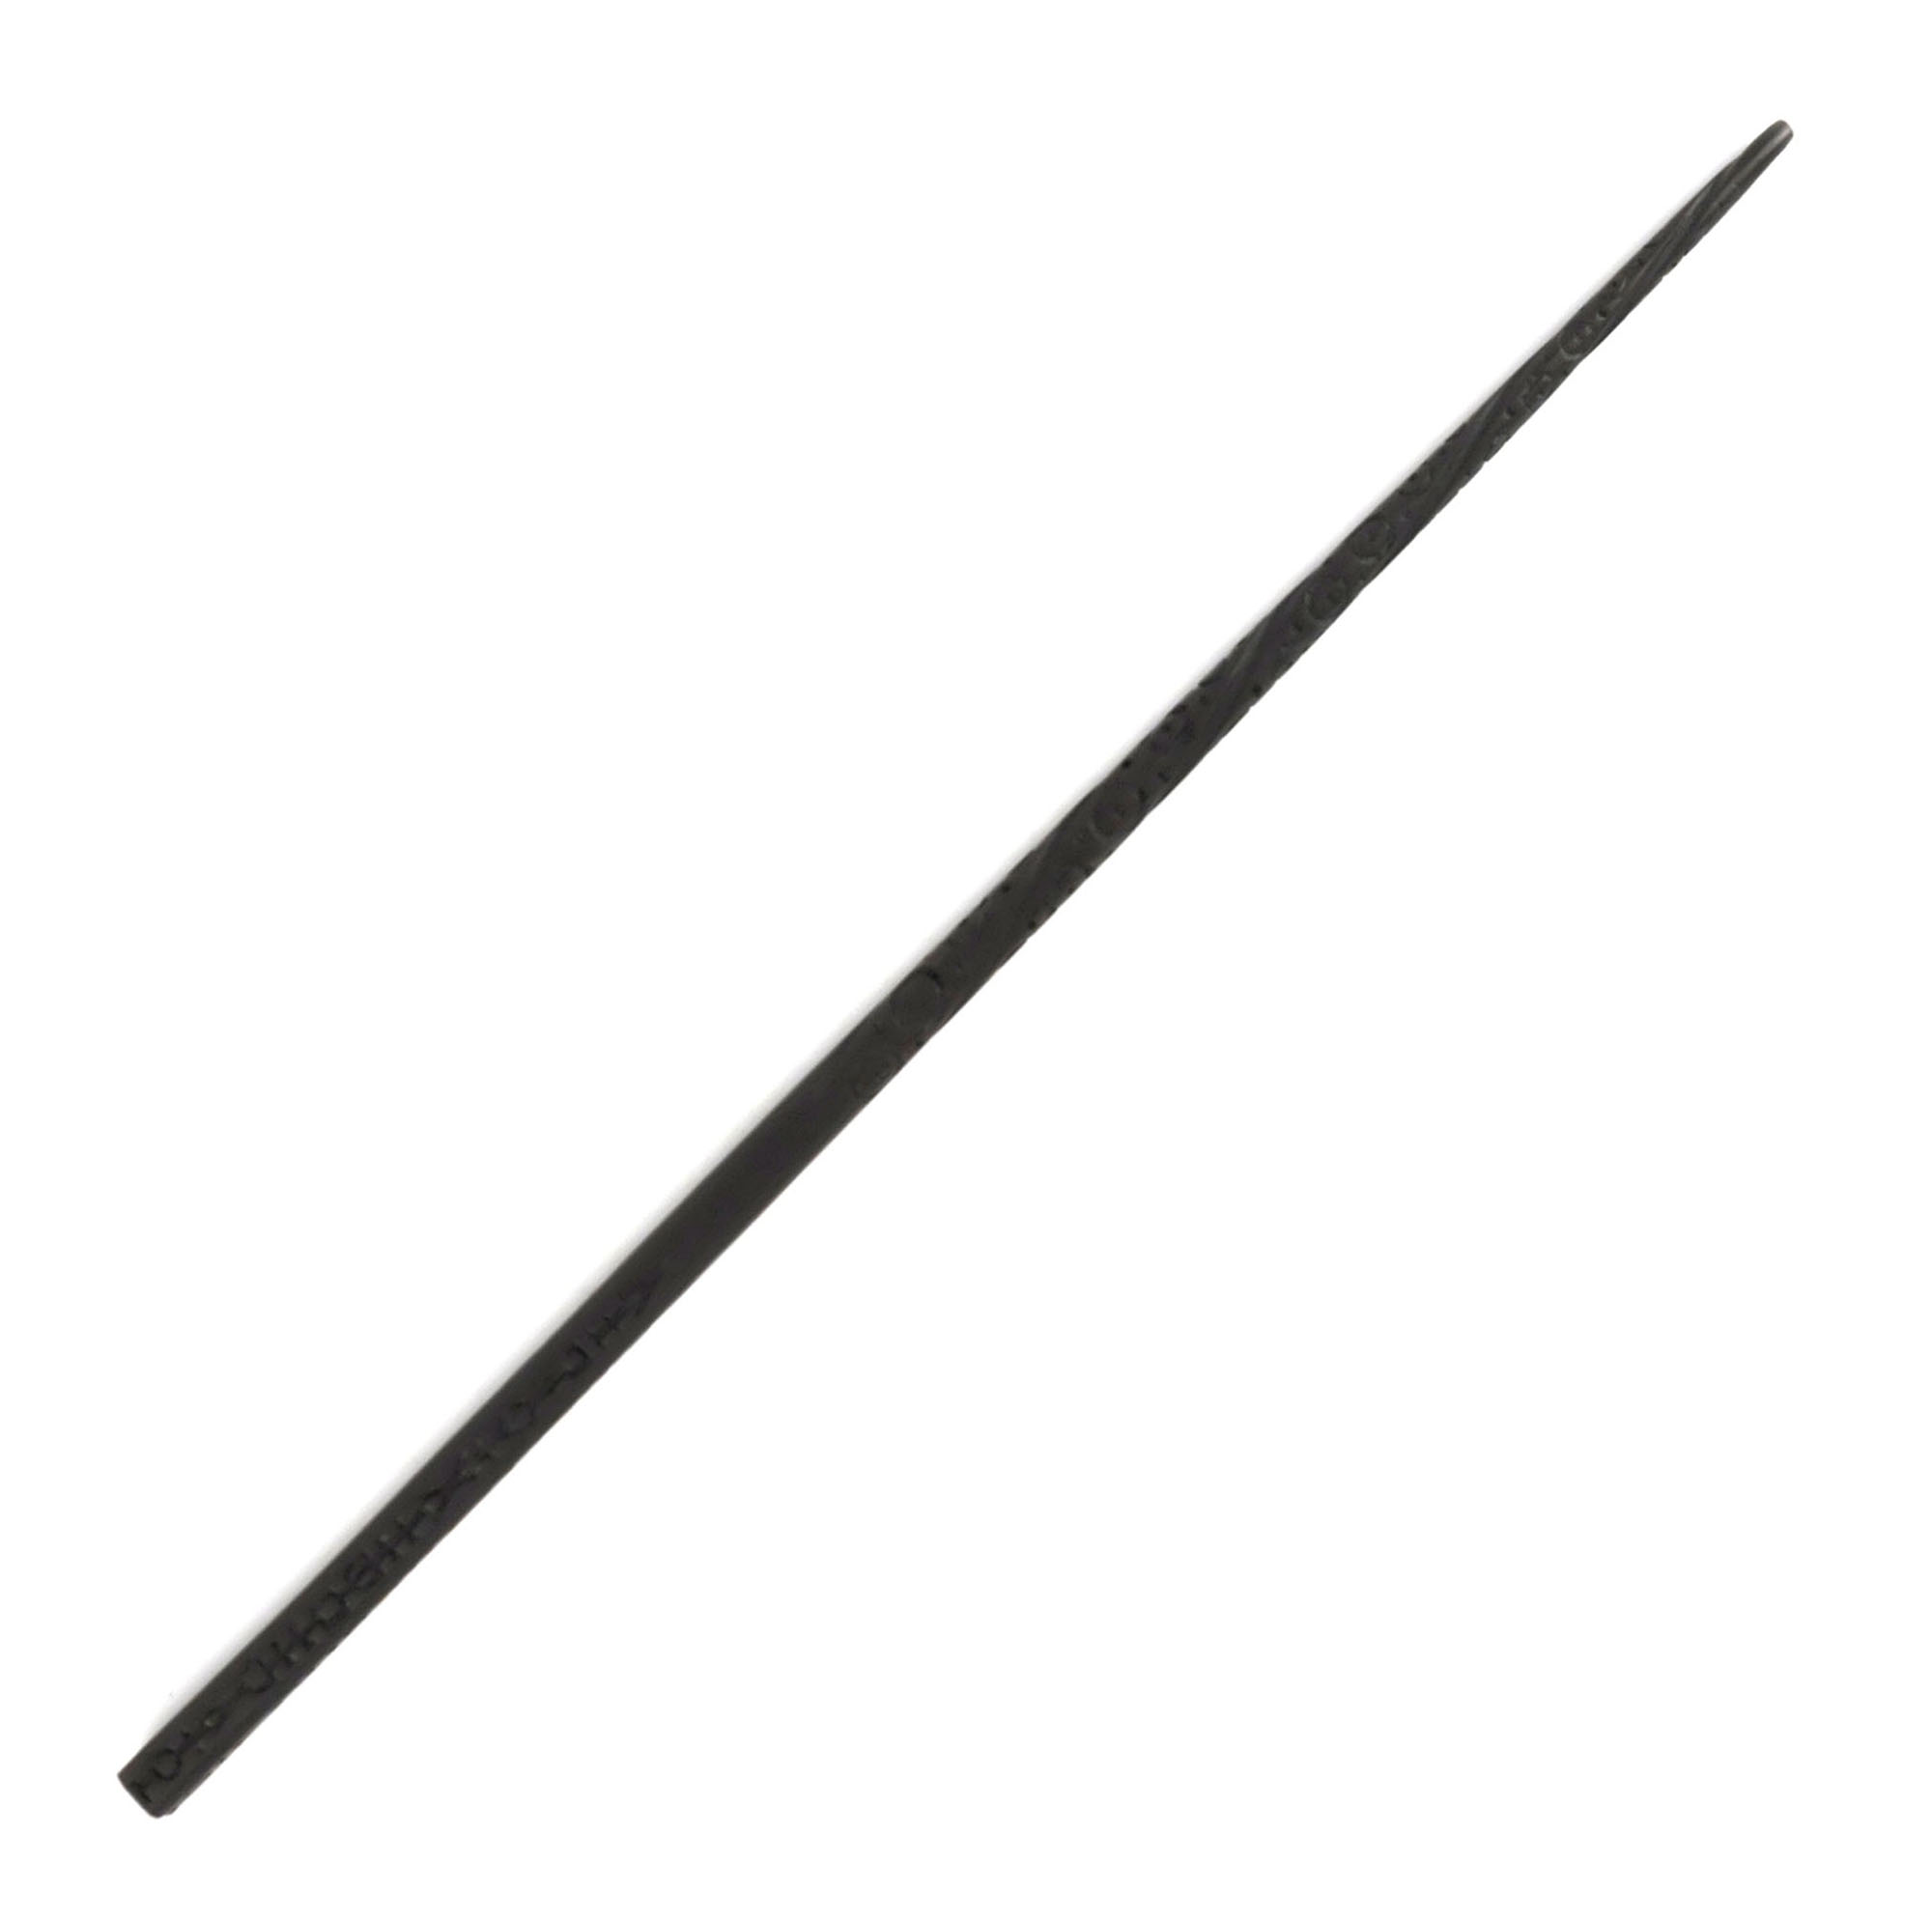 Harry Potter Replica Sirius Black Wand With Ollivanders